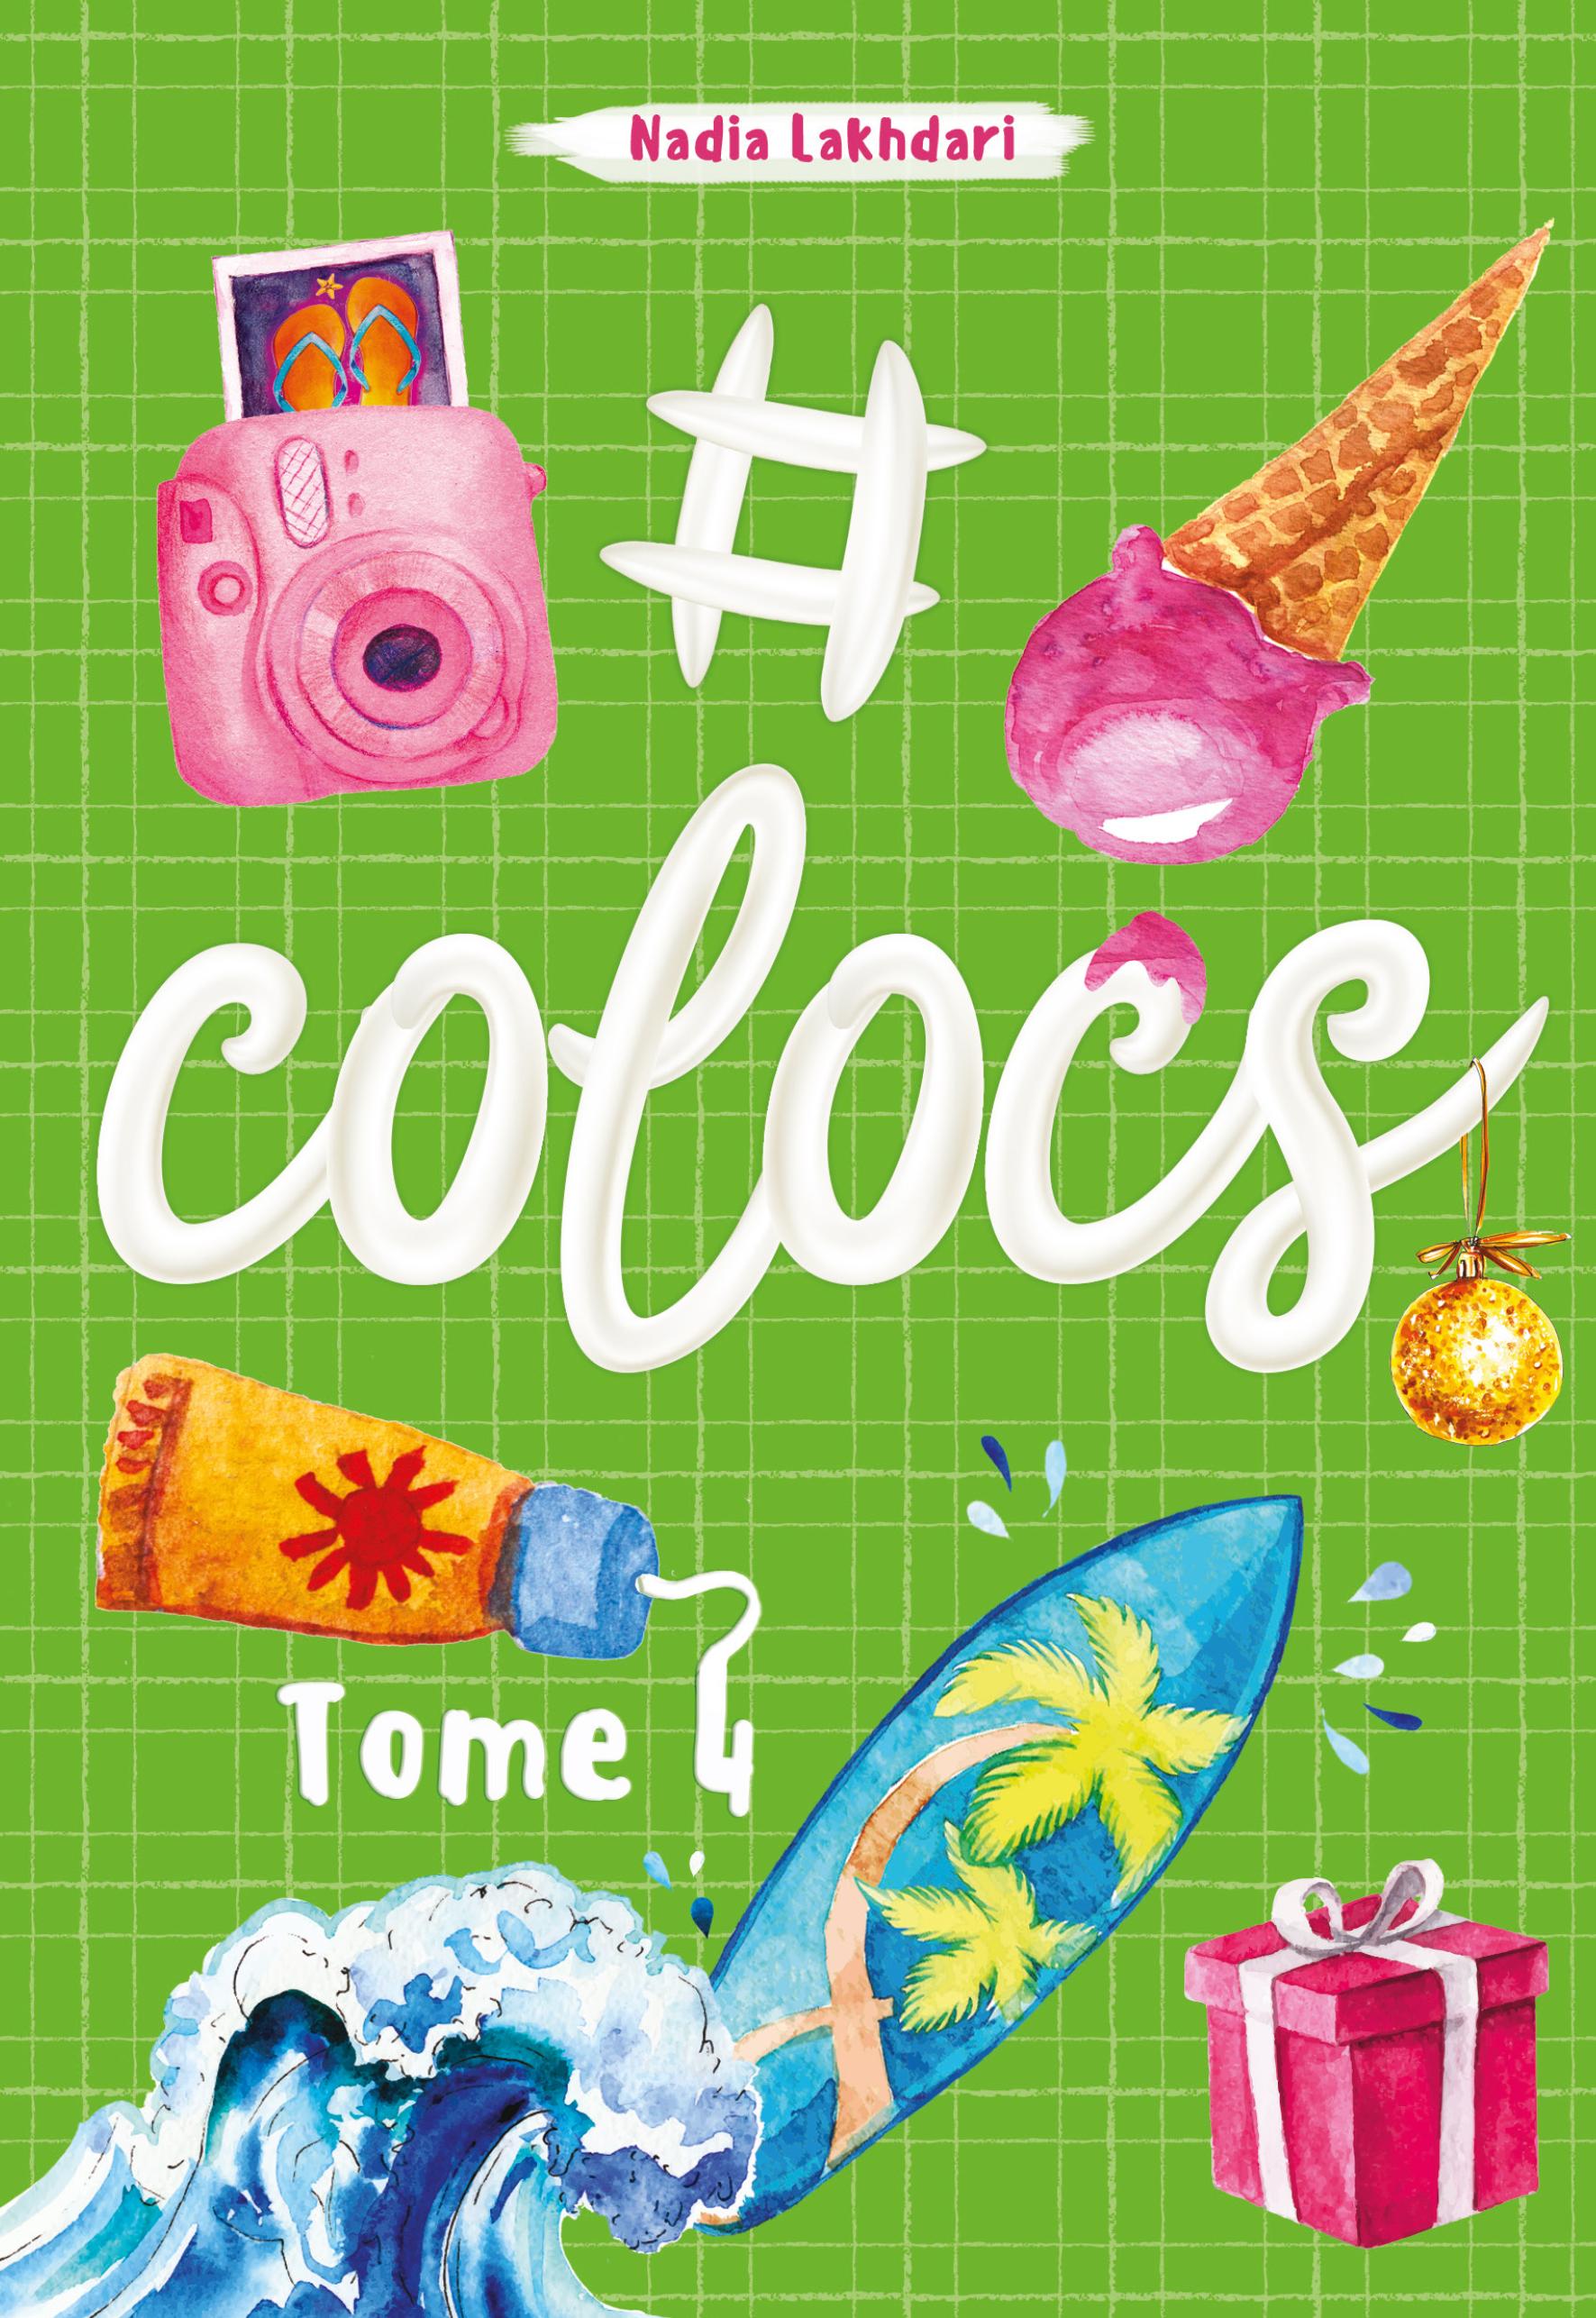 #Colocs tome 4